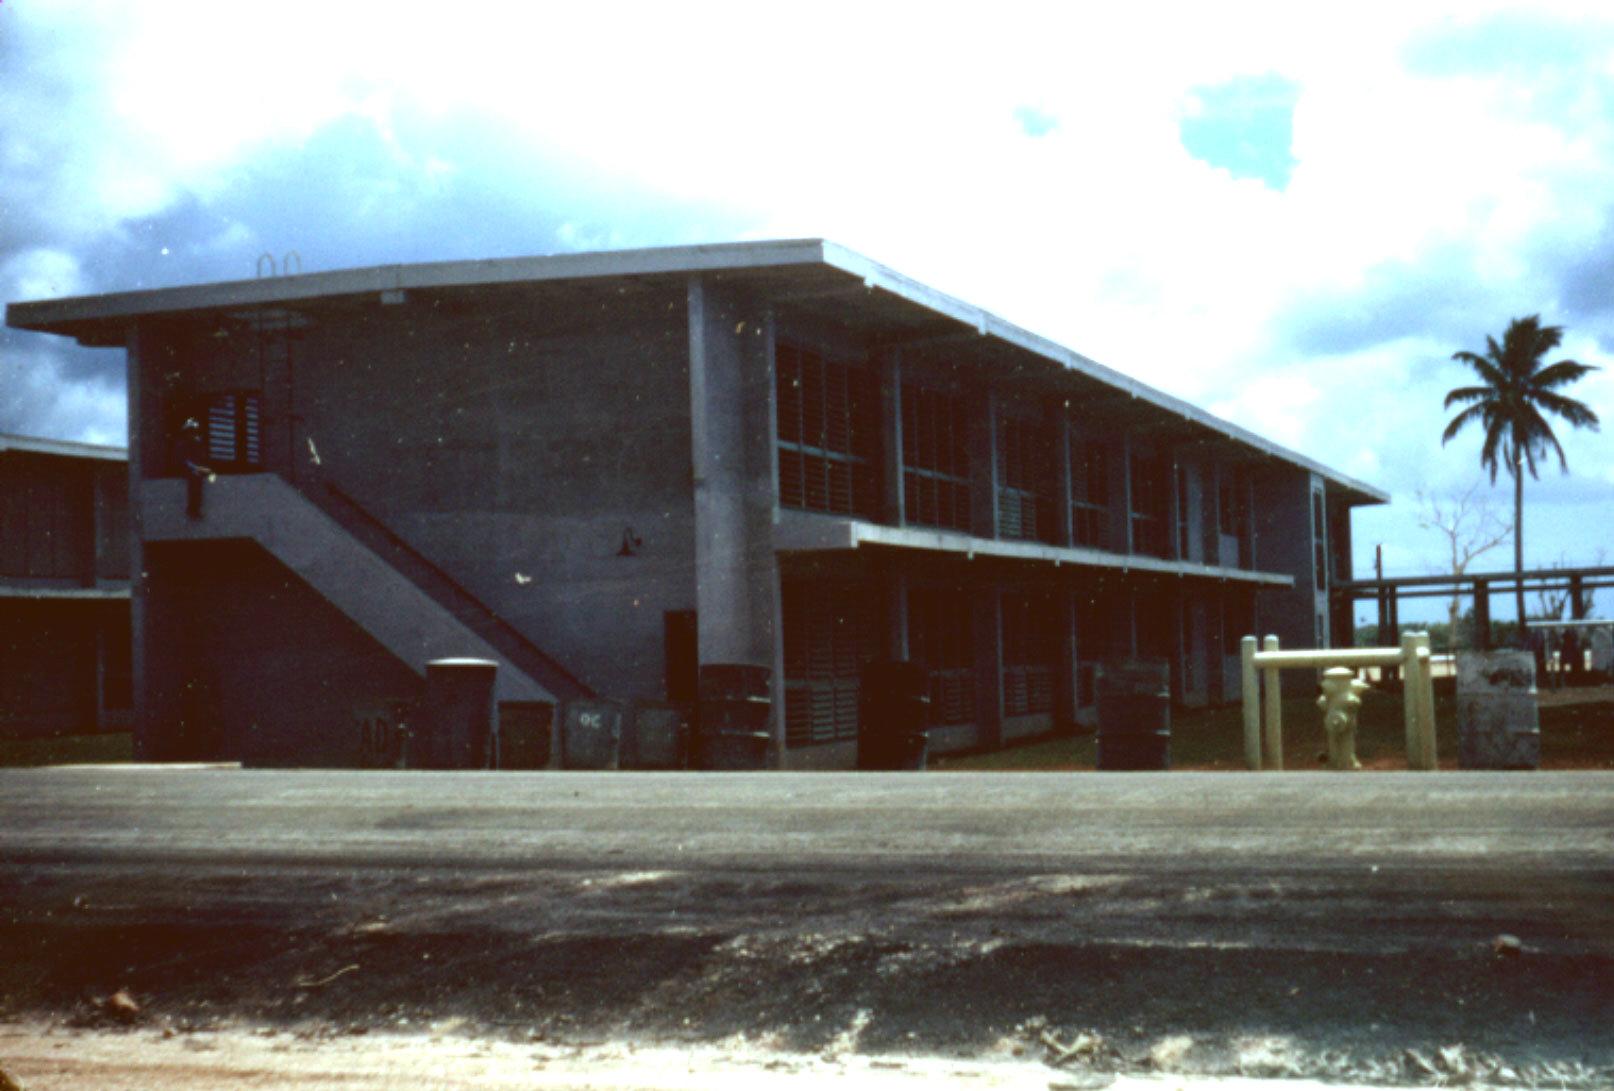 Ncs Guam Circa 1953 1955 Photos Courtesy Of Robert Maytum